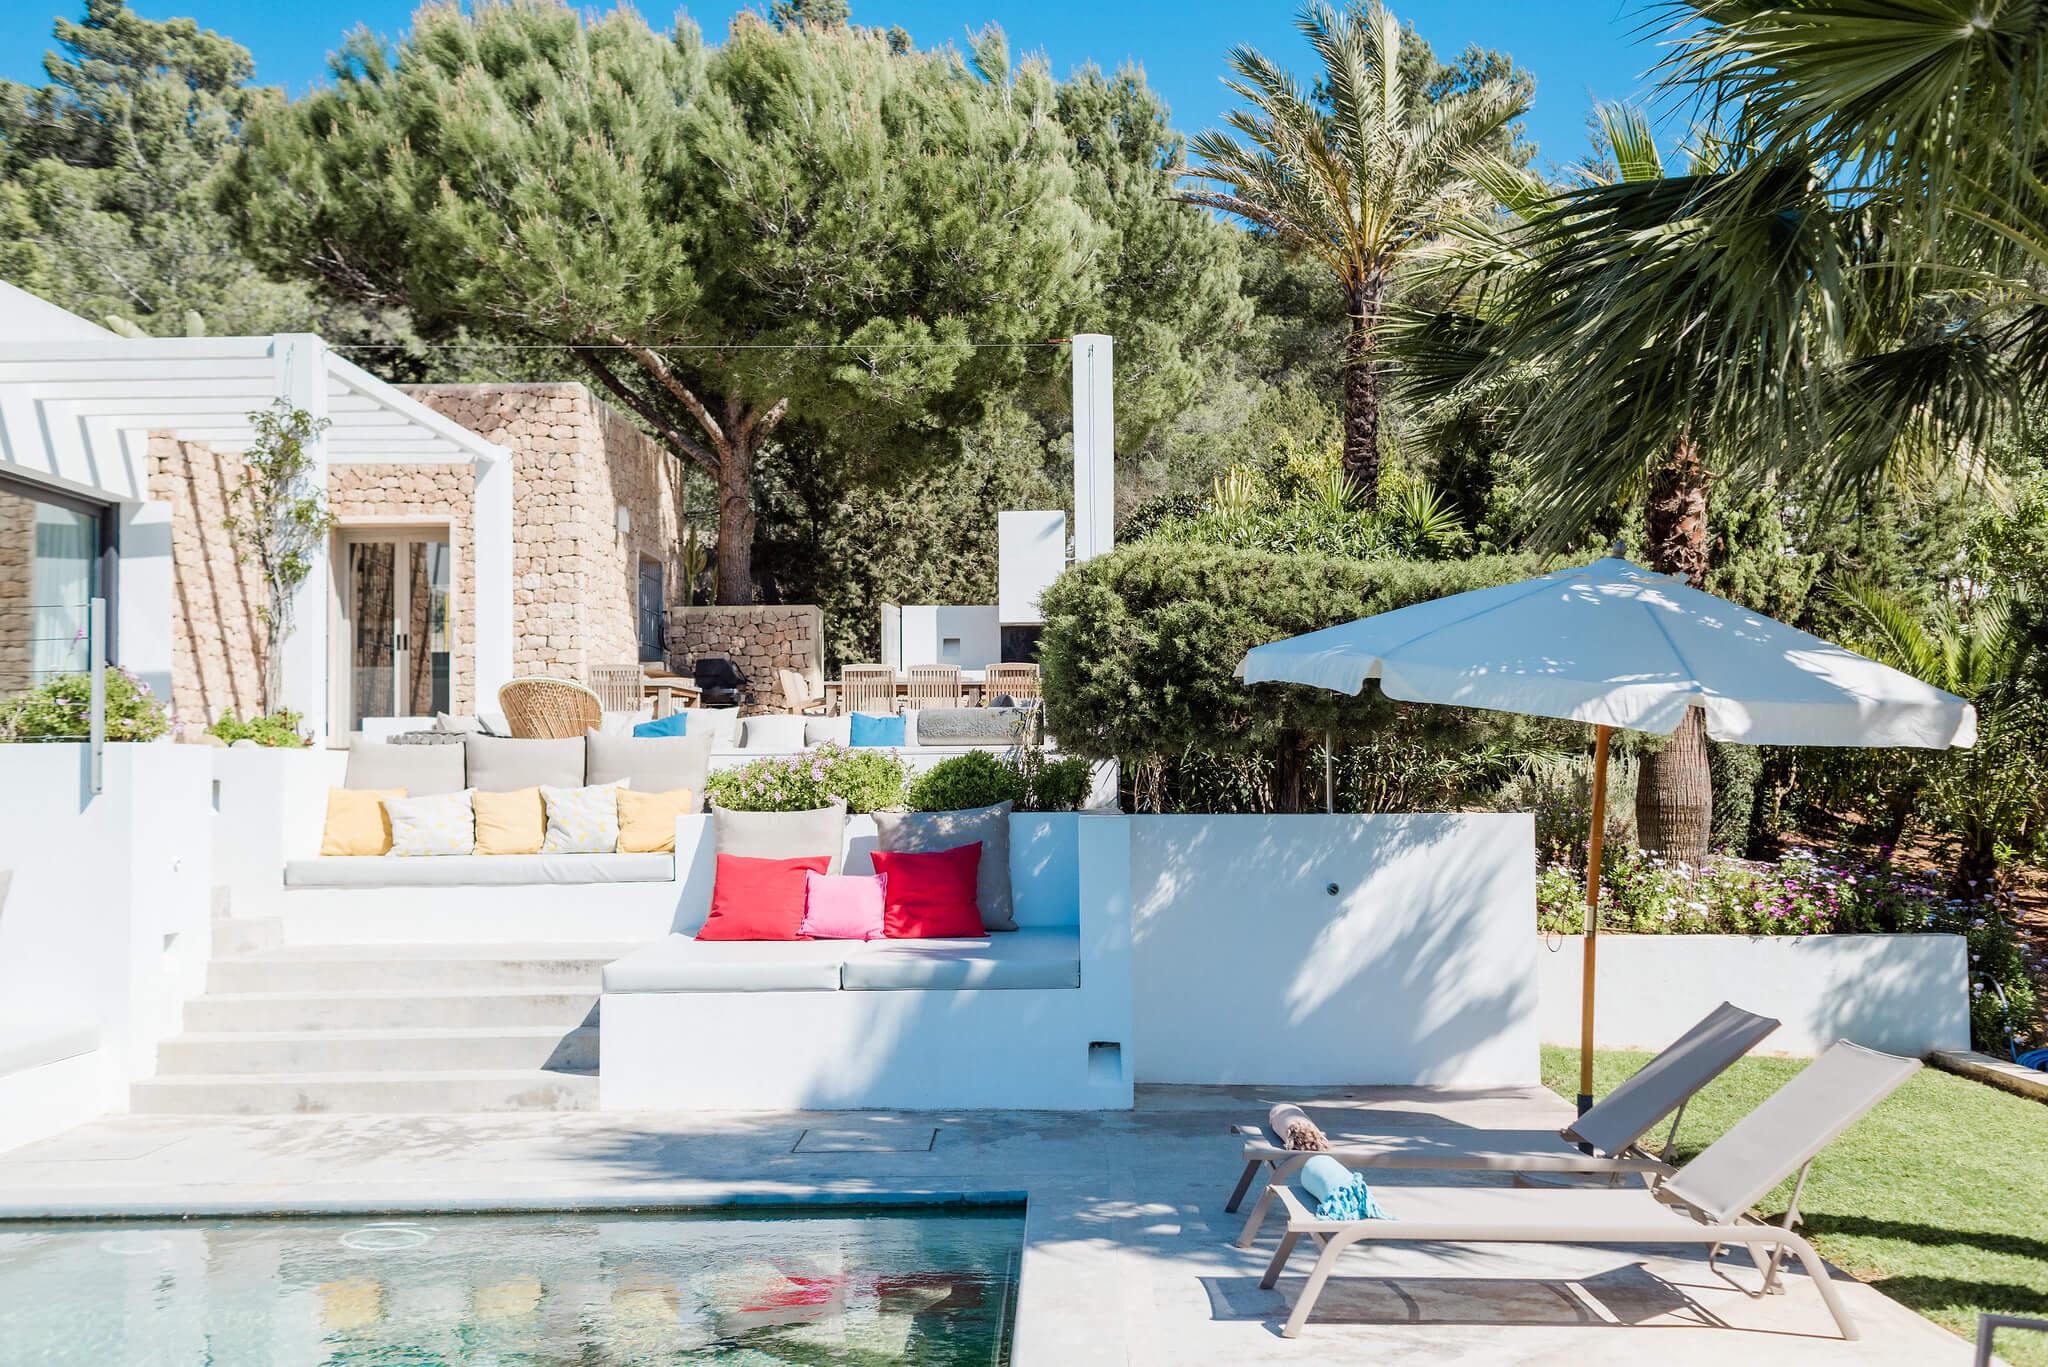 https://www.white-ibiza.com/wp-content/uploads/2020/06/white-ibiza-villas-casa-nyah-exterior-sunloungers.jpg